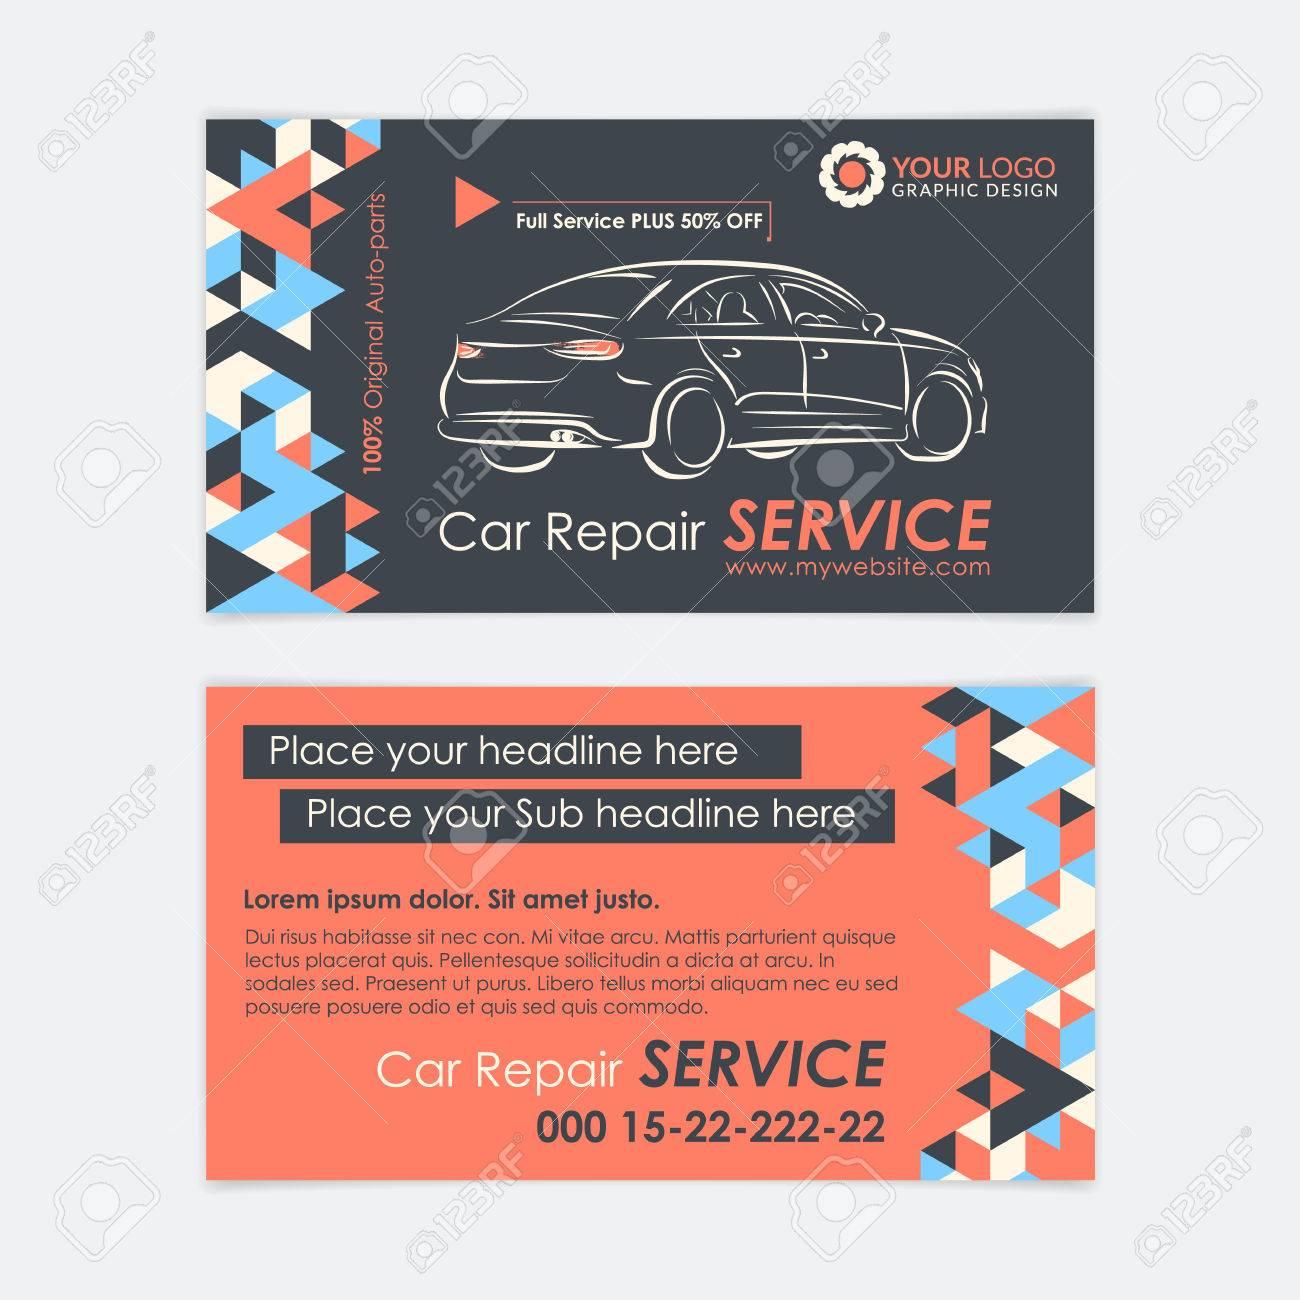 Automotive service business card template car diagnostics and automotive service business card template car diagnostics and transport repair create your own business fbccfo Images